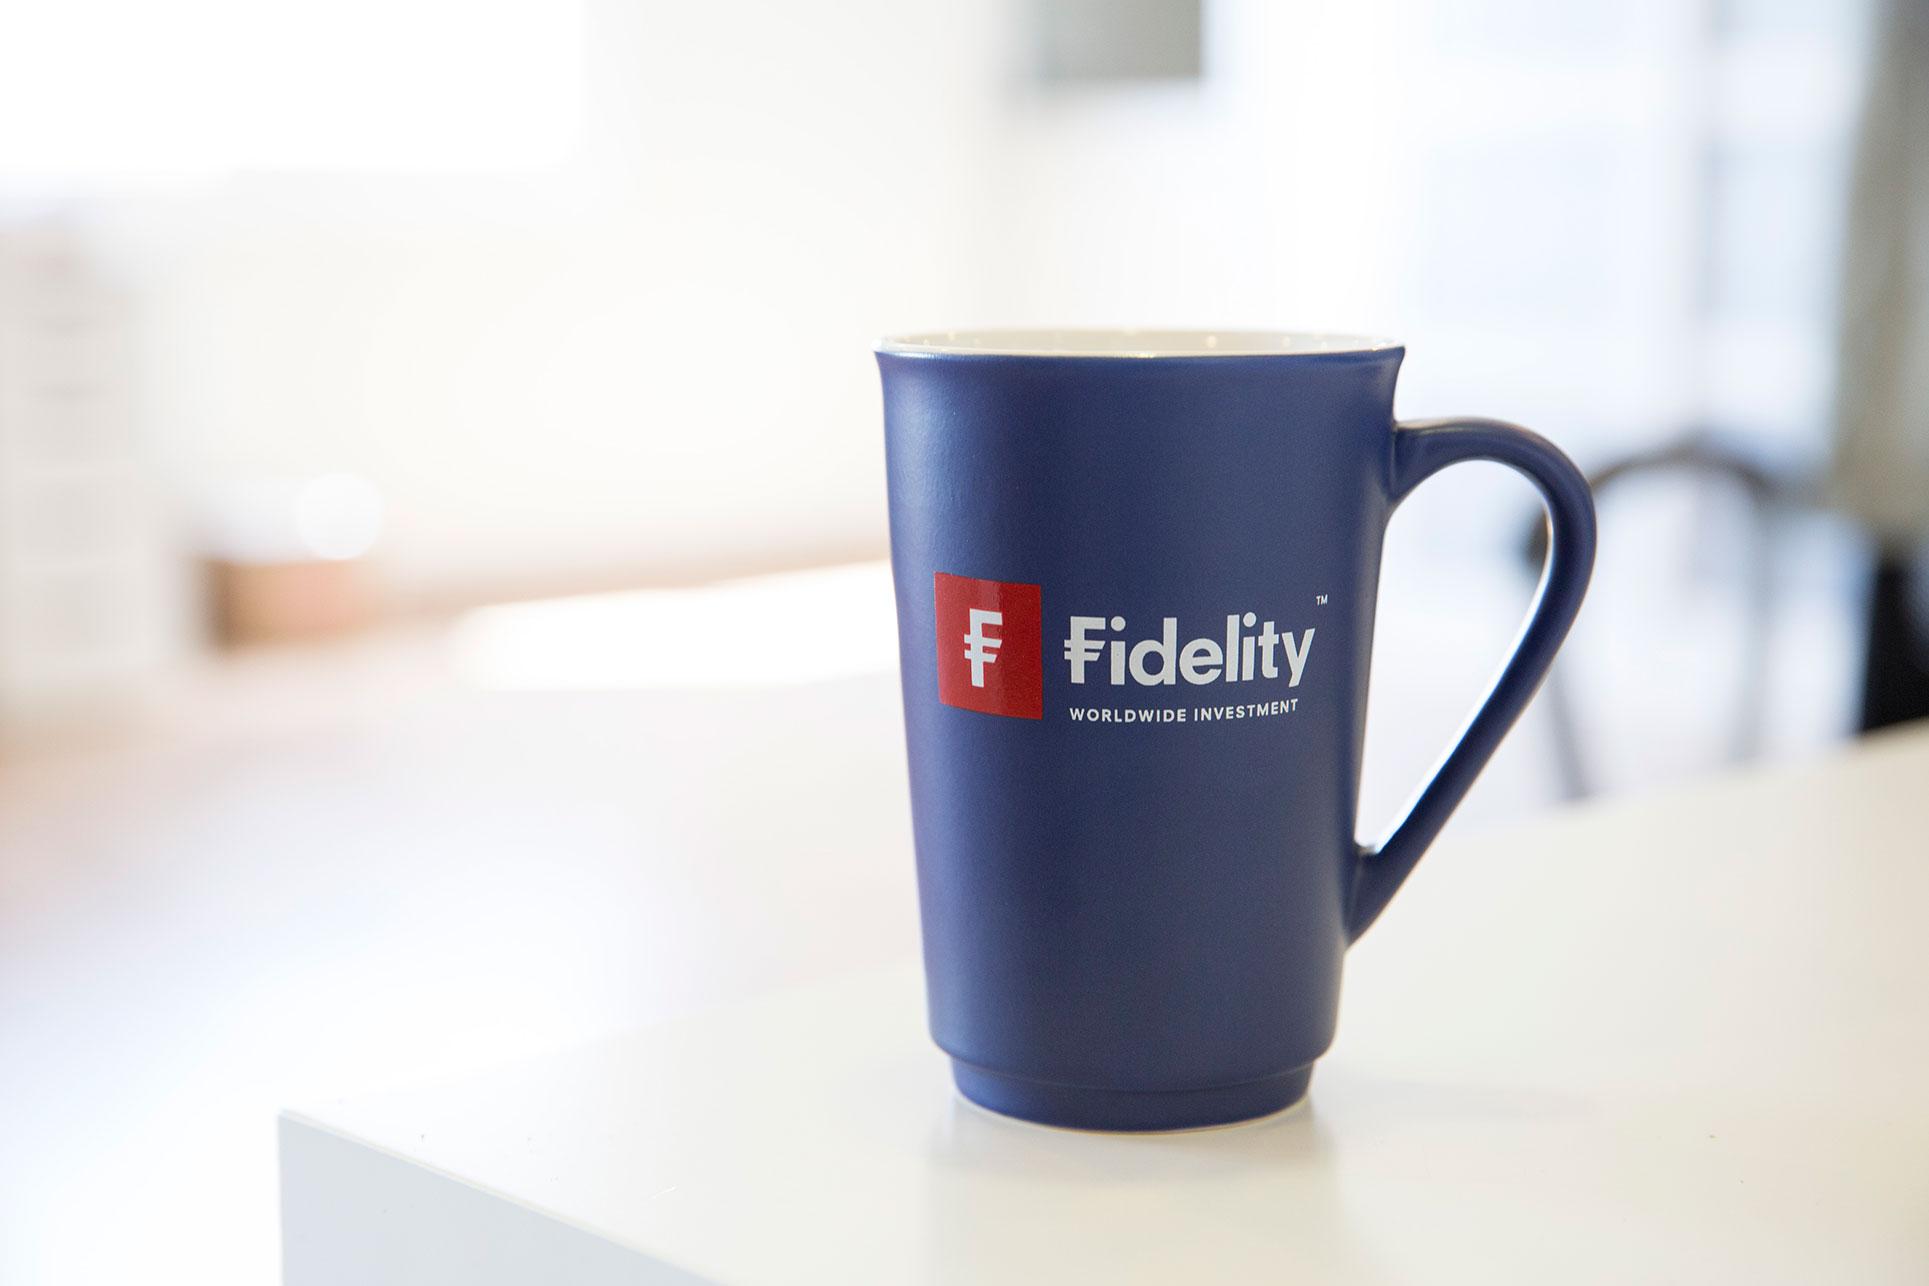 Mug mate personnalisé avec logo